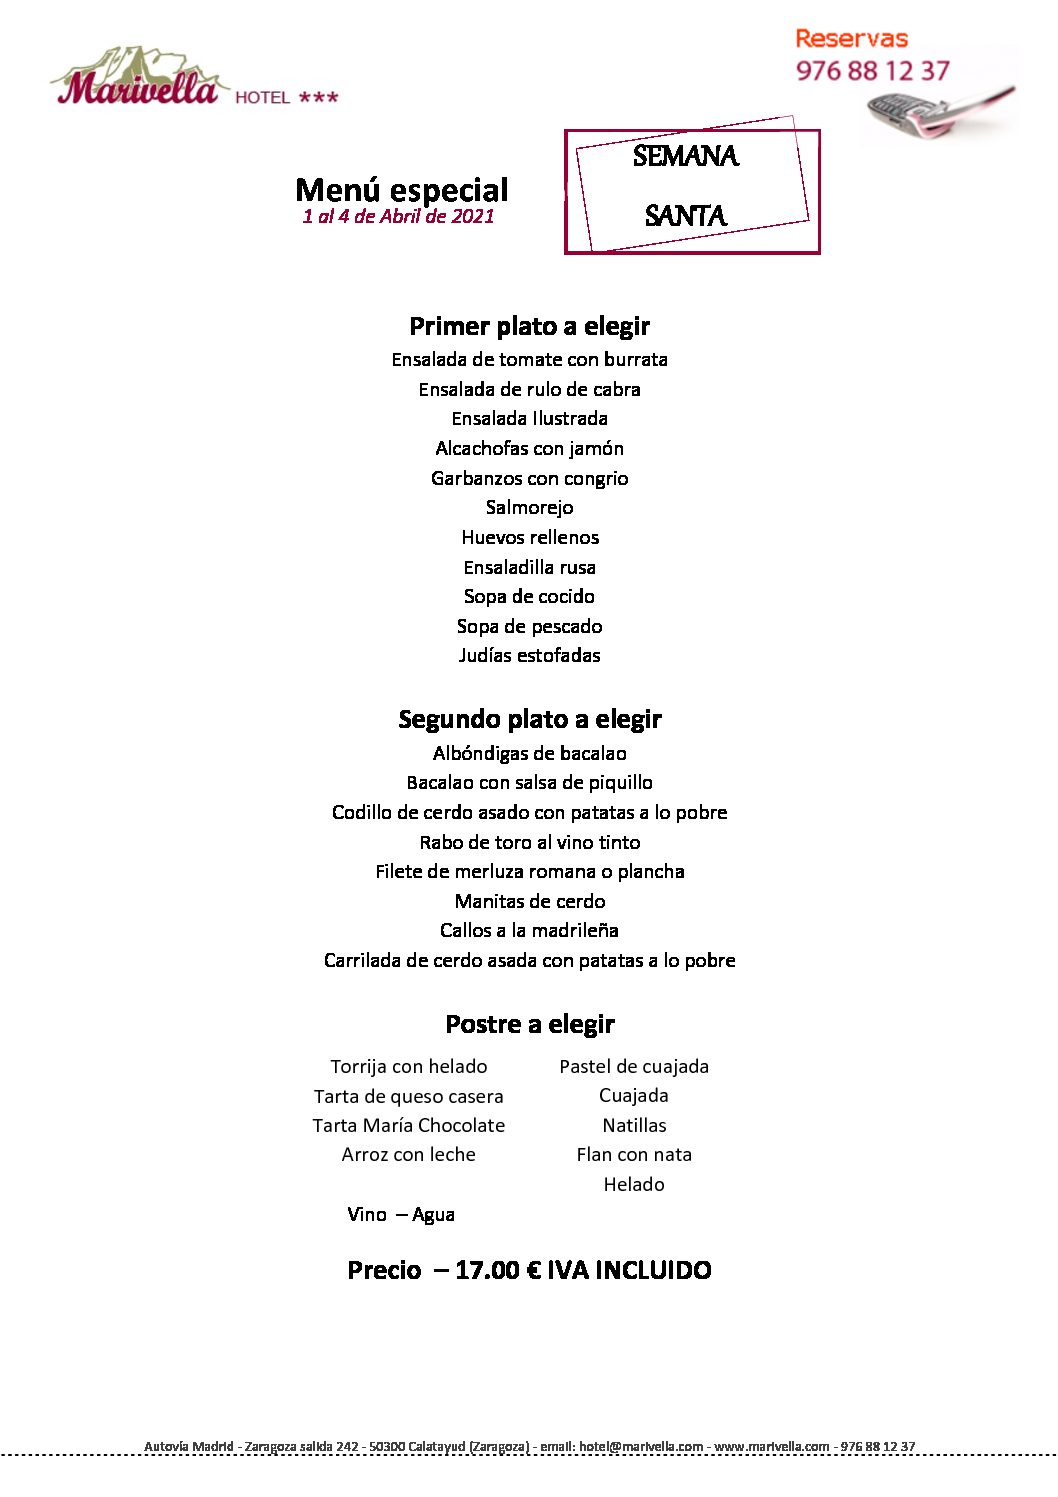 menu-especial-semana-santa-2021-1-al-4-abril-pdf.jpg